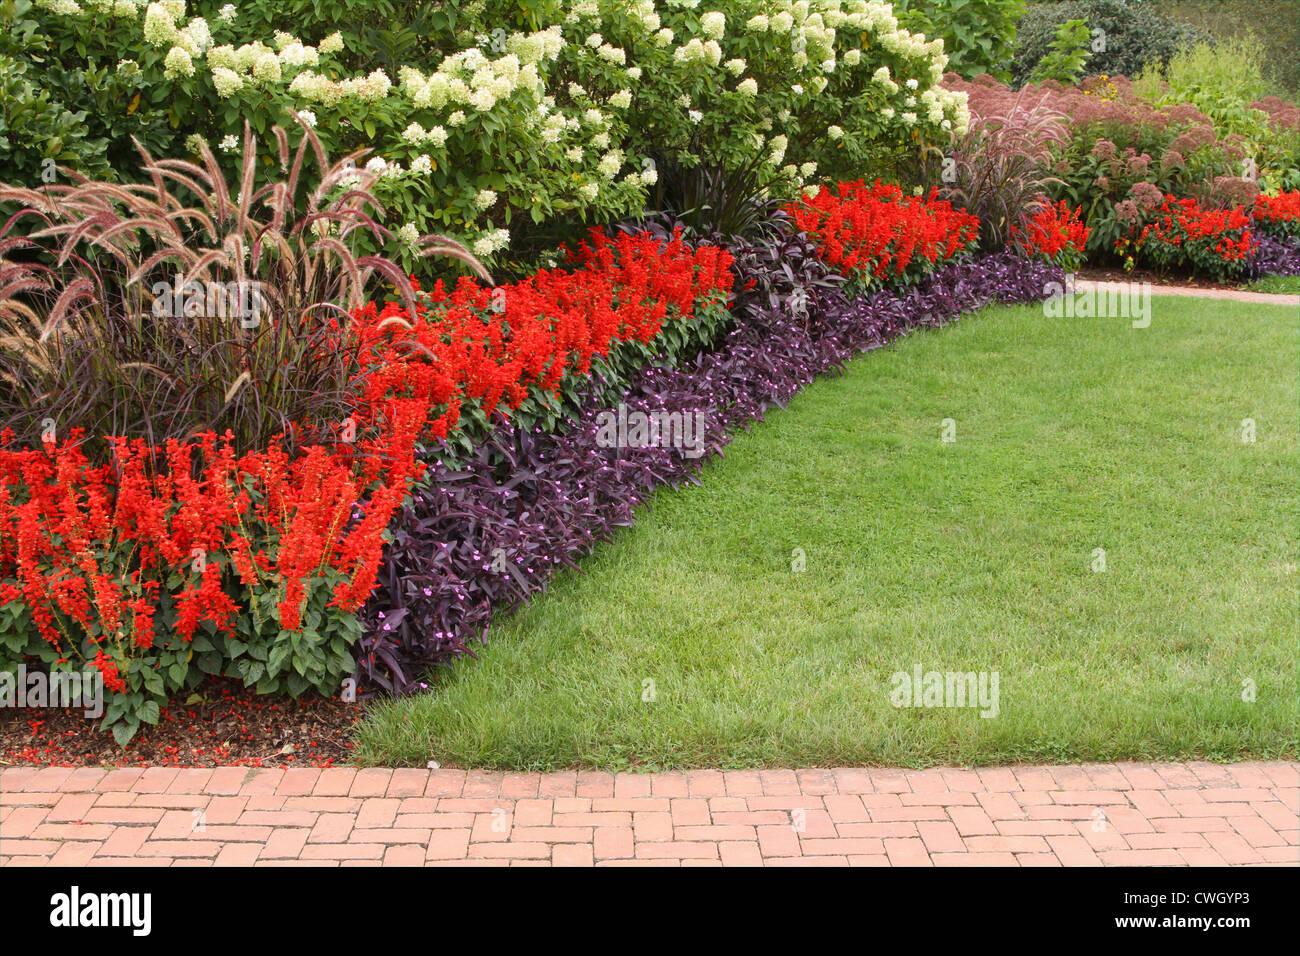 Professional landscaping kingwood center mansfield ohio for Professional landscaping